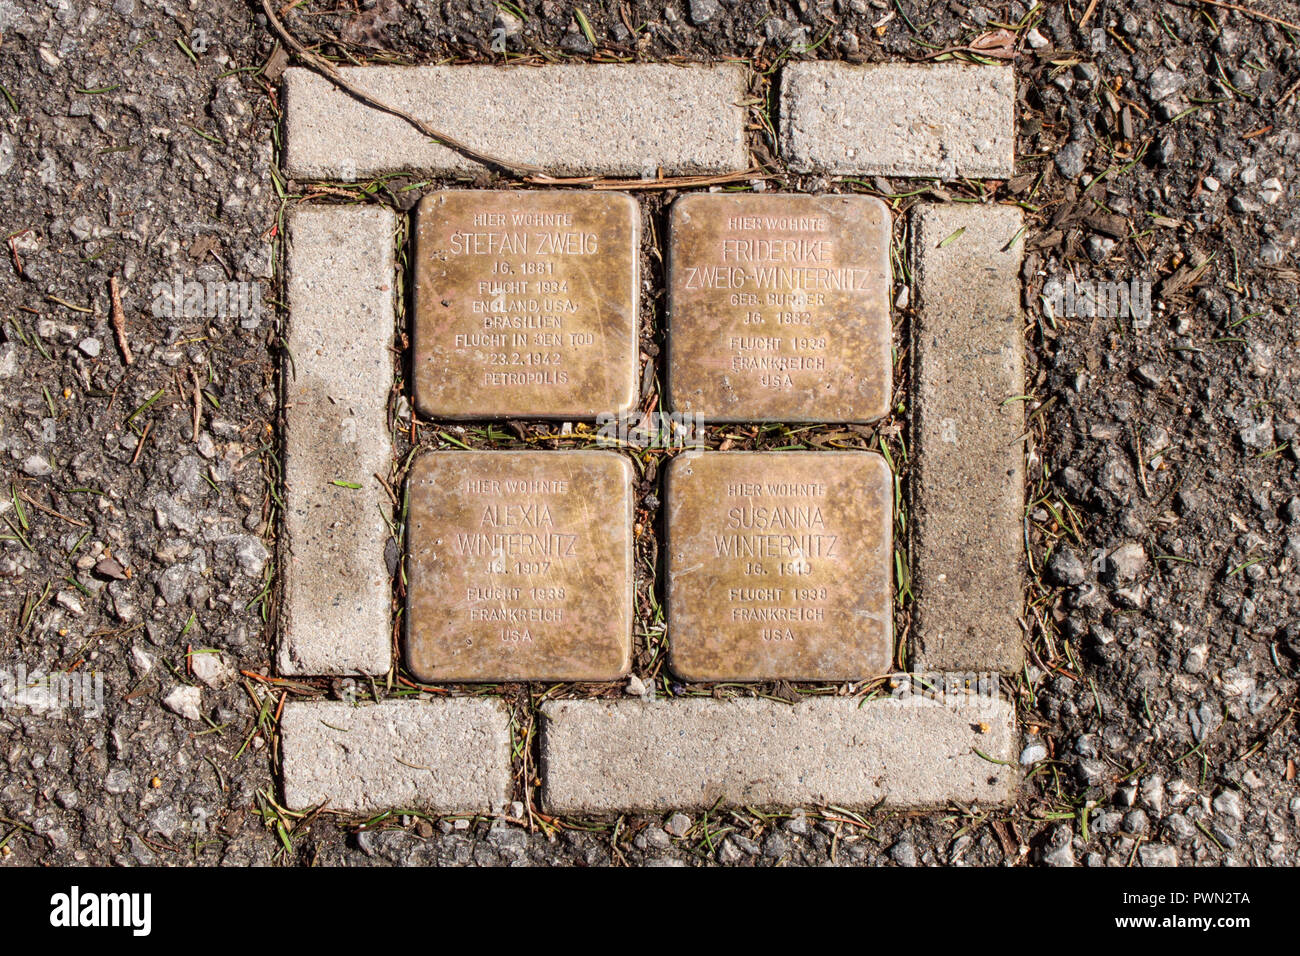 Salzburg, Austria - April 6, 2018: Stolperstein ('stumbling stones') on Kapuzinerberg commemorating austrian author Stefan Zweig and his family. - Stock Image